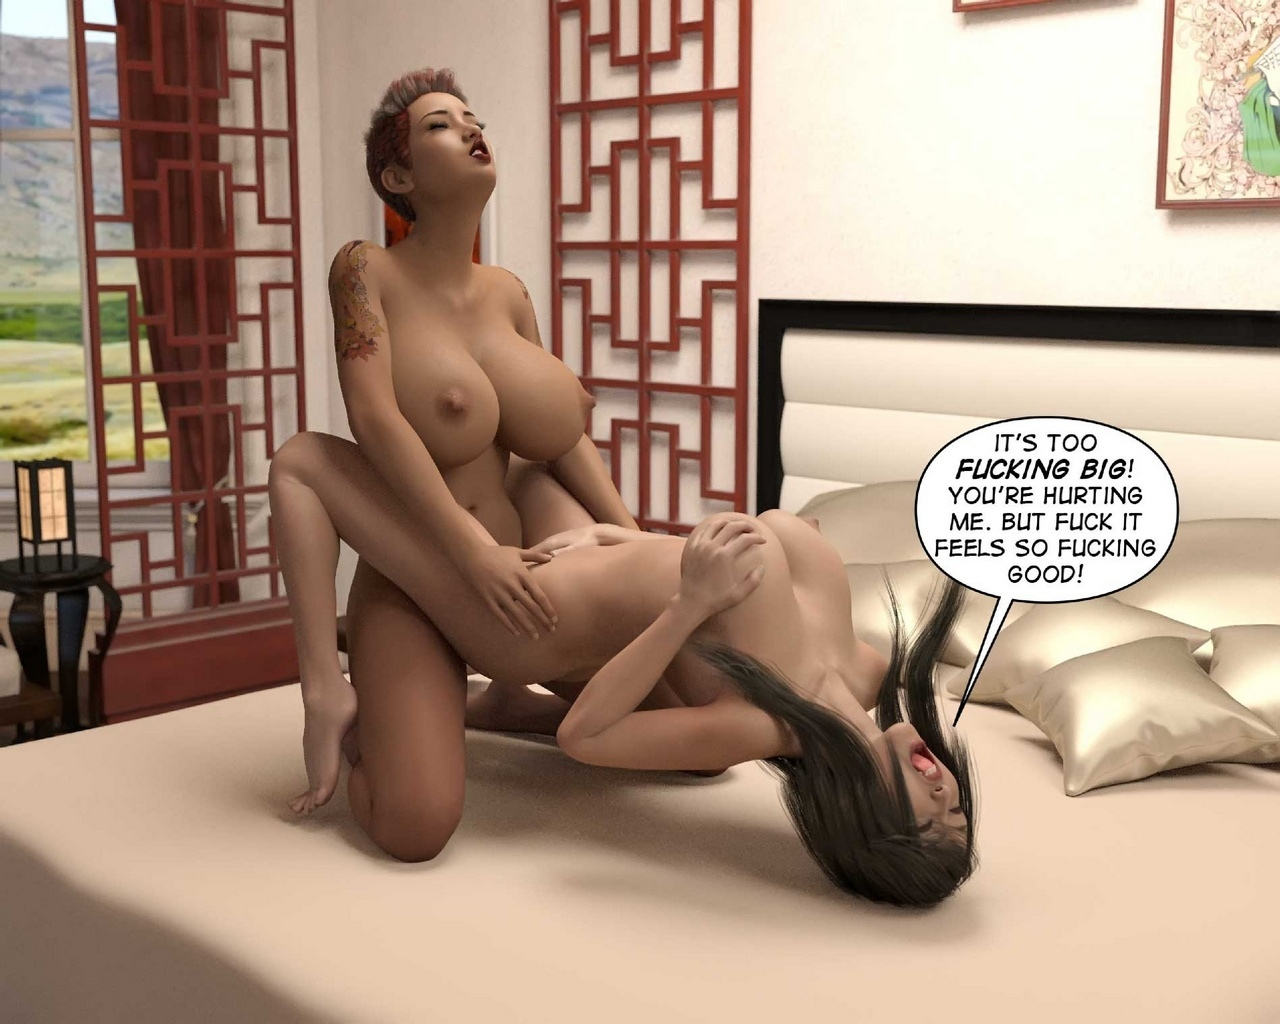 Plumbing-Service 49 free sex comic